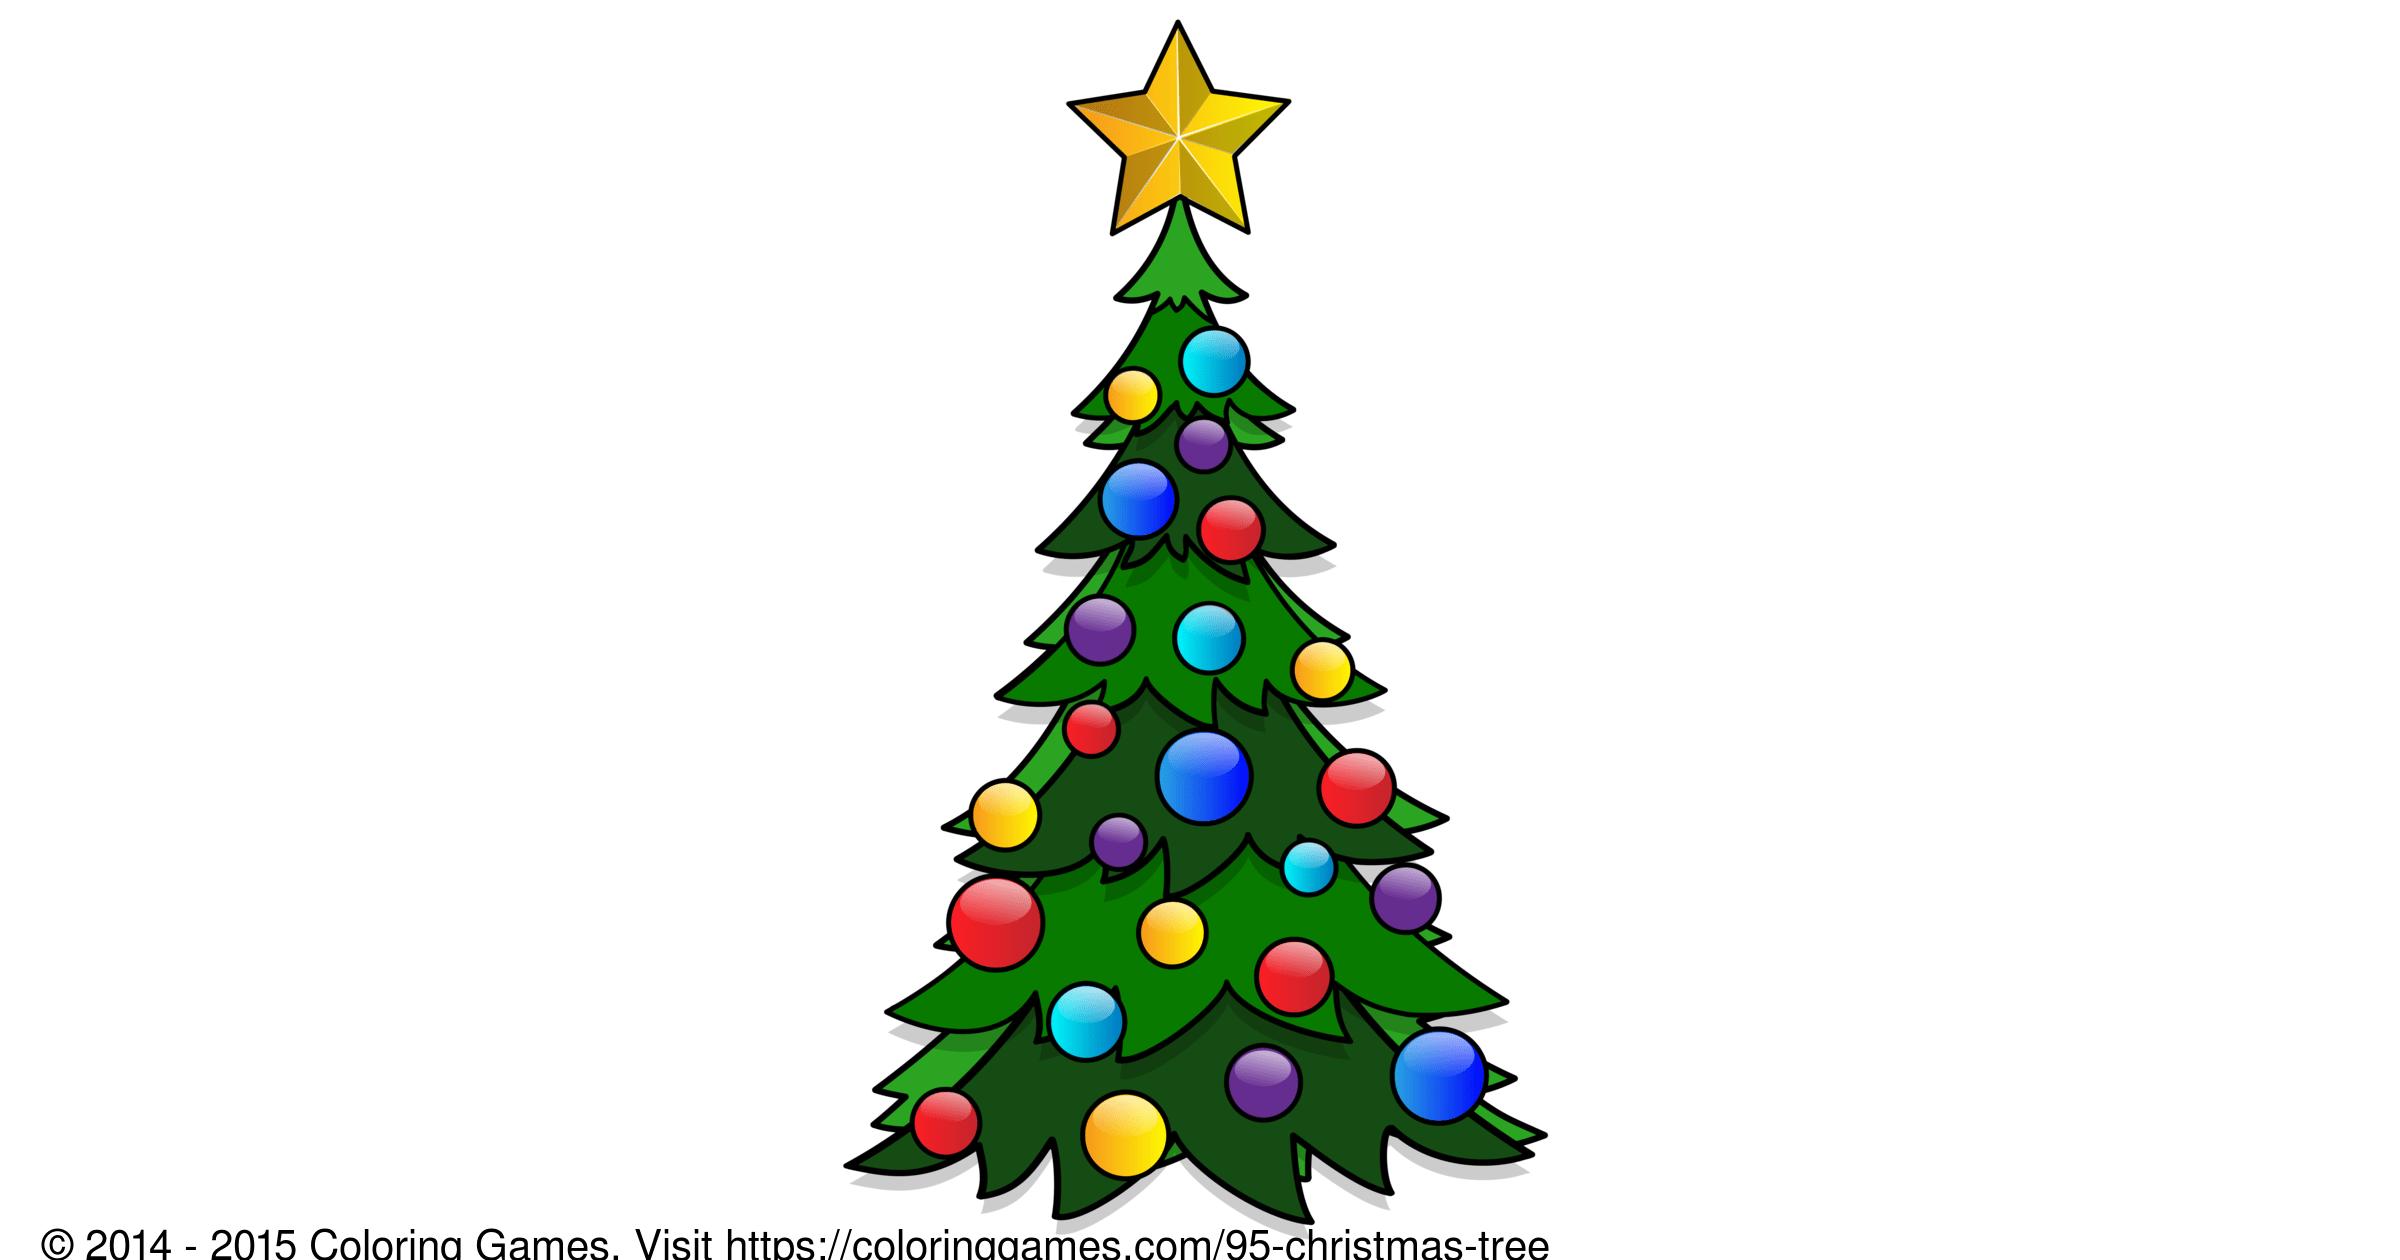 Xmas Tree Coloring Pages - Car-essay